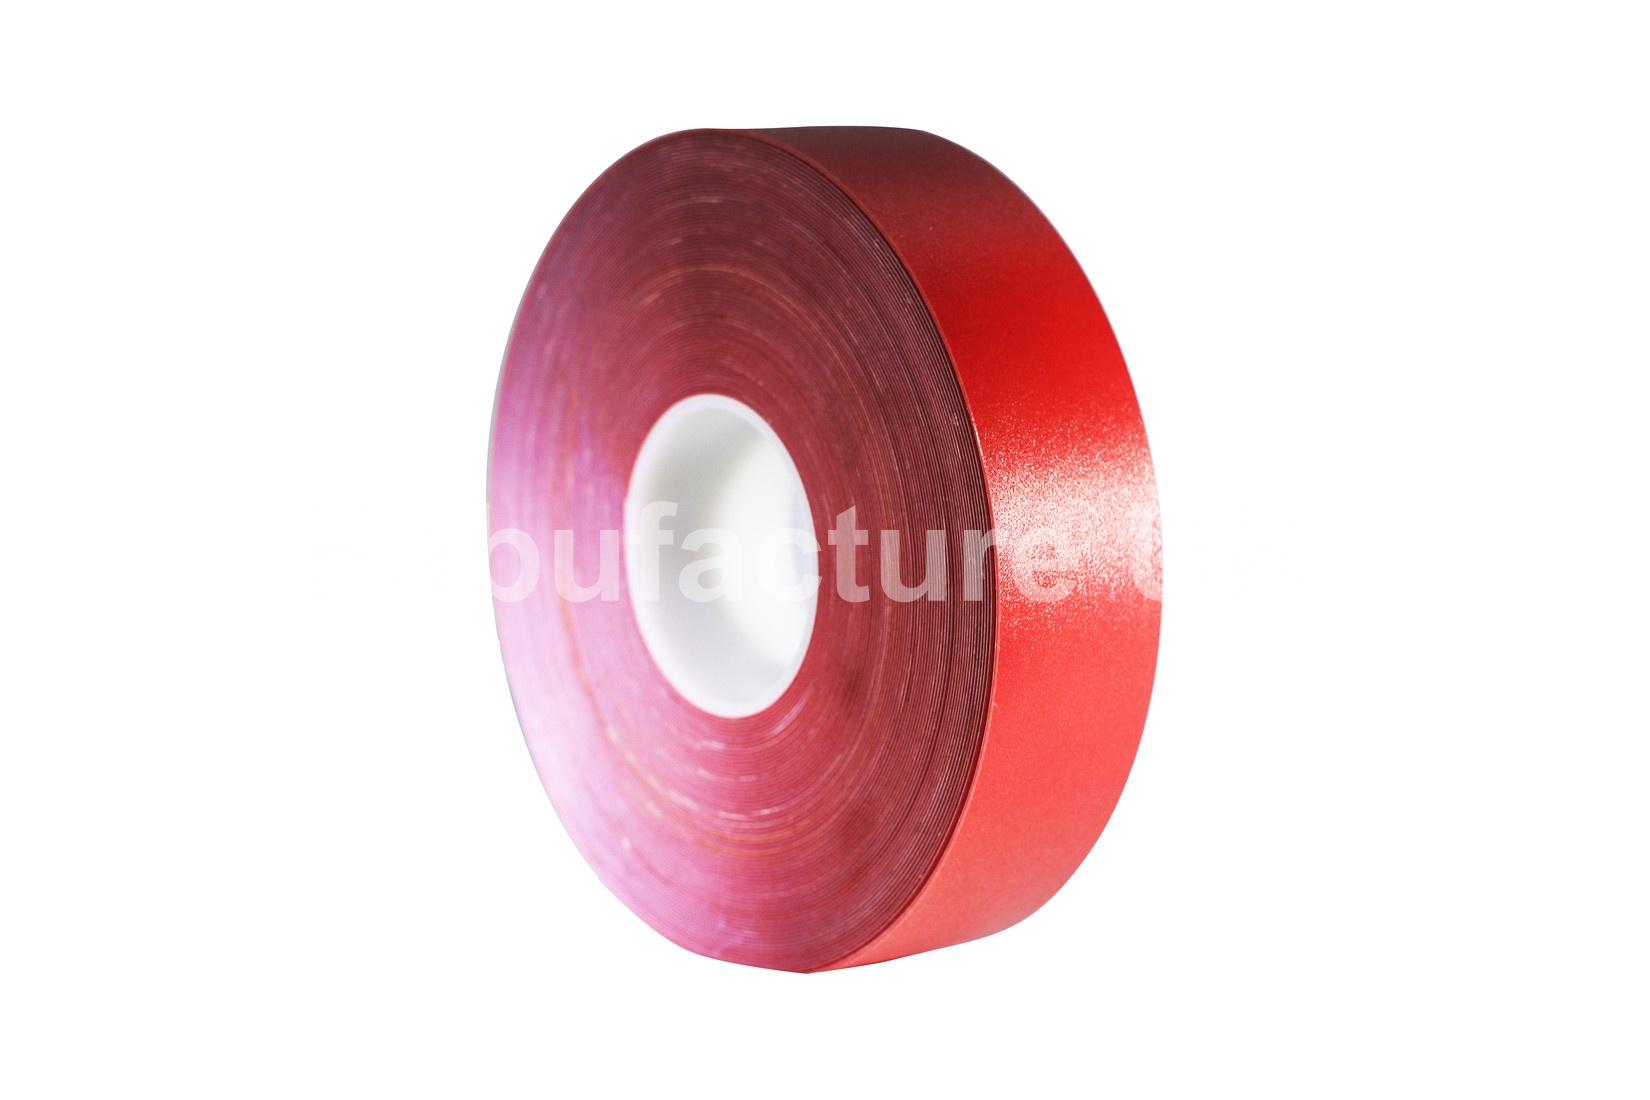 Heavy Duty Aisle Floor Marking Tape Sku 7361 The 5s